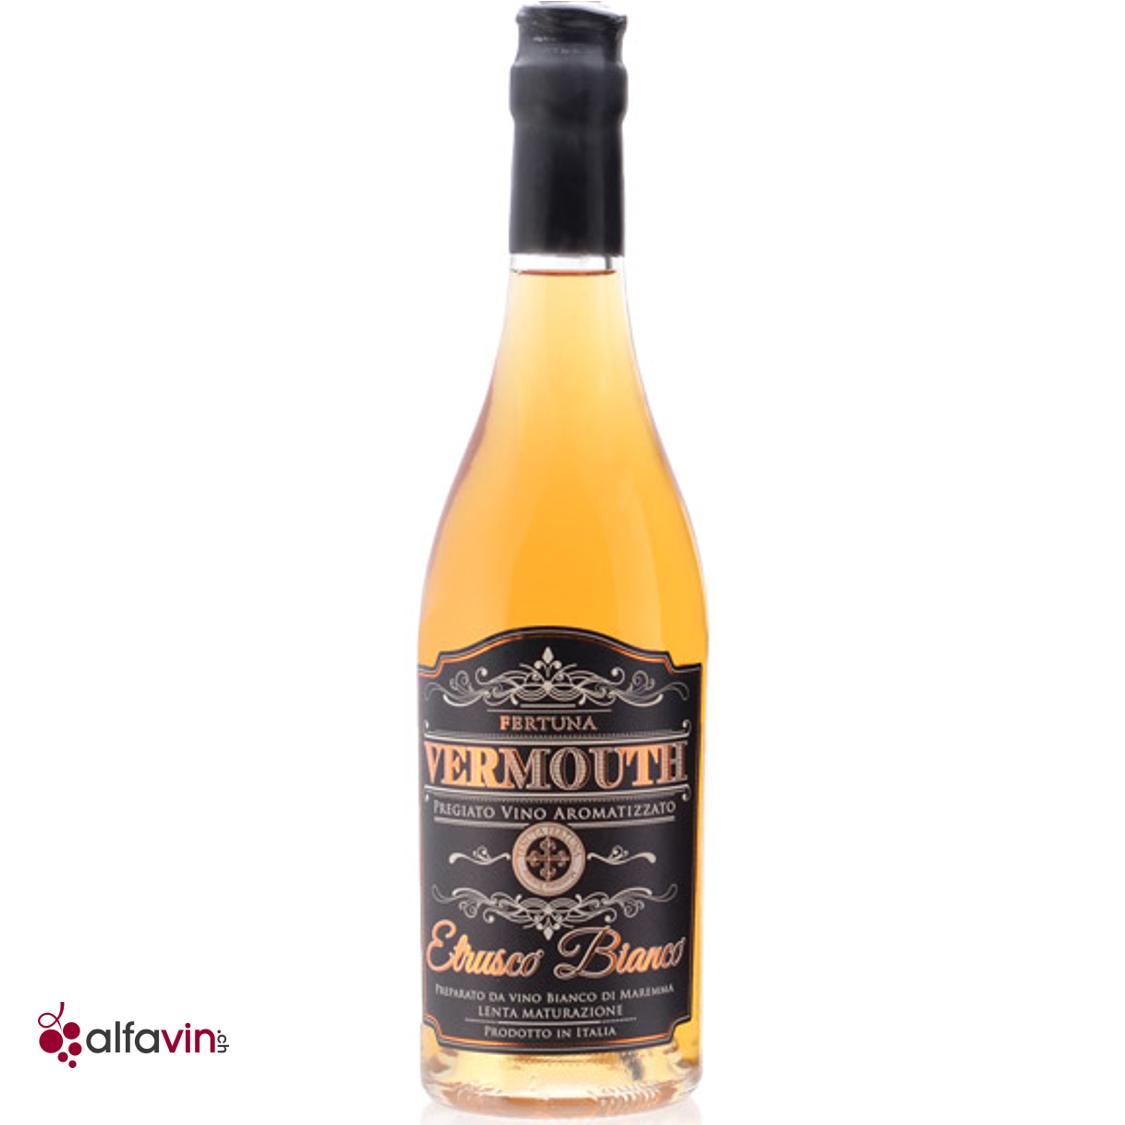 Vermouth Etrusco Bianco